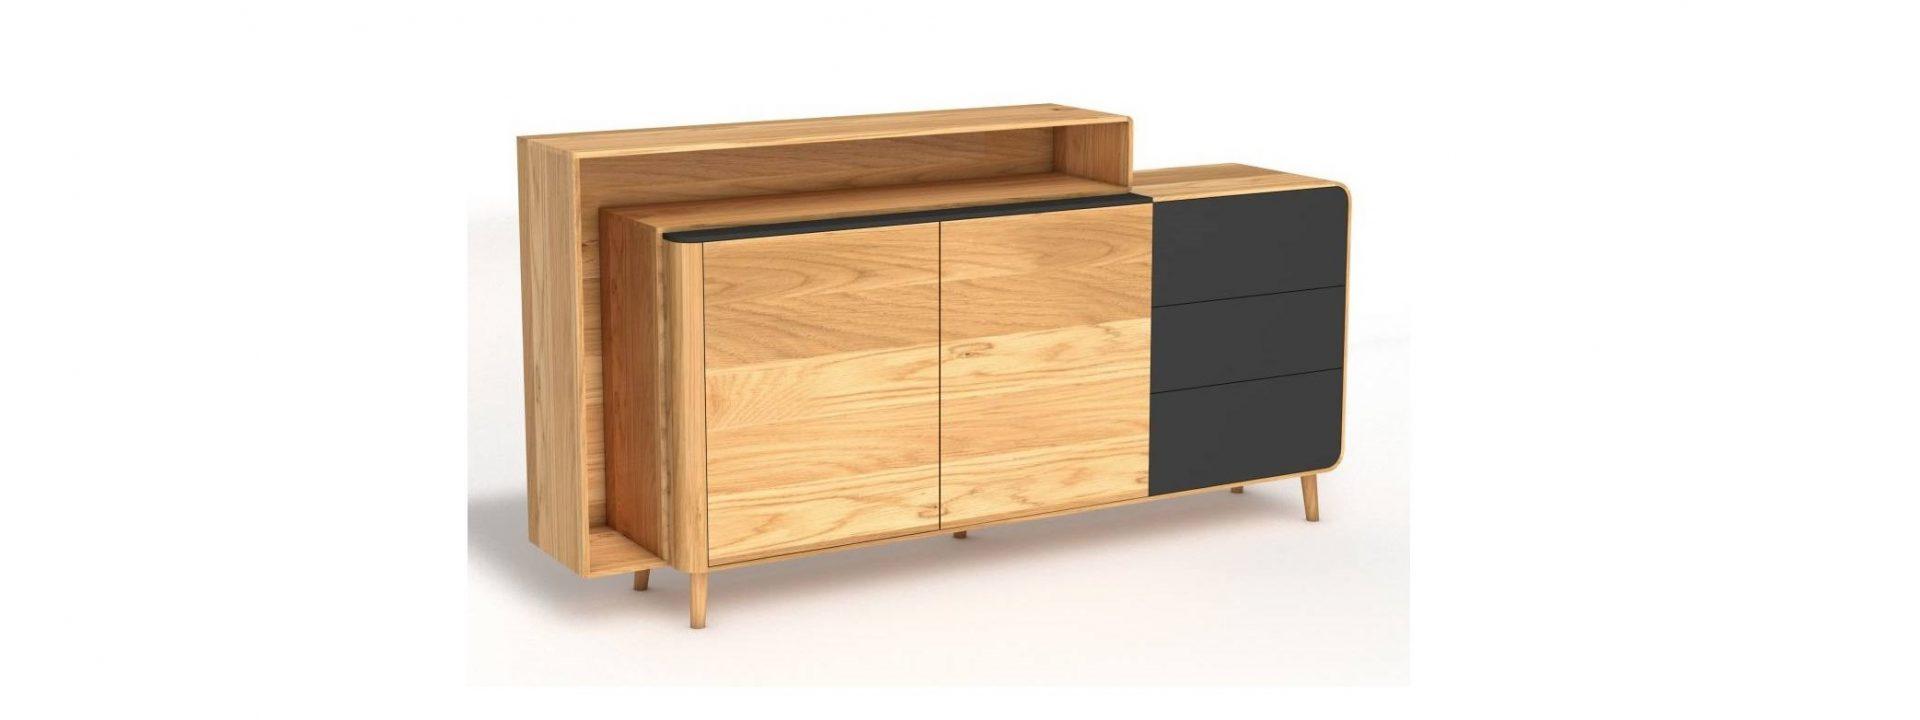 Oh Sofa - Kredens 2D3S Polaris 2